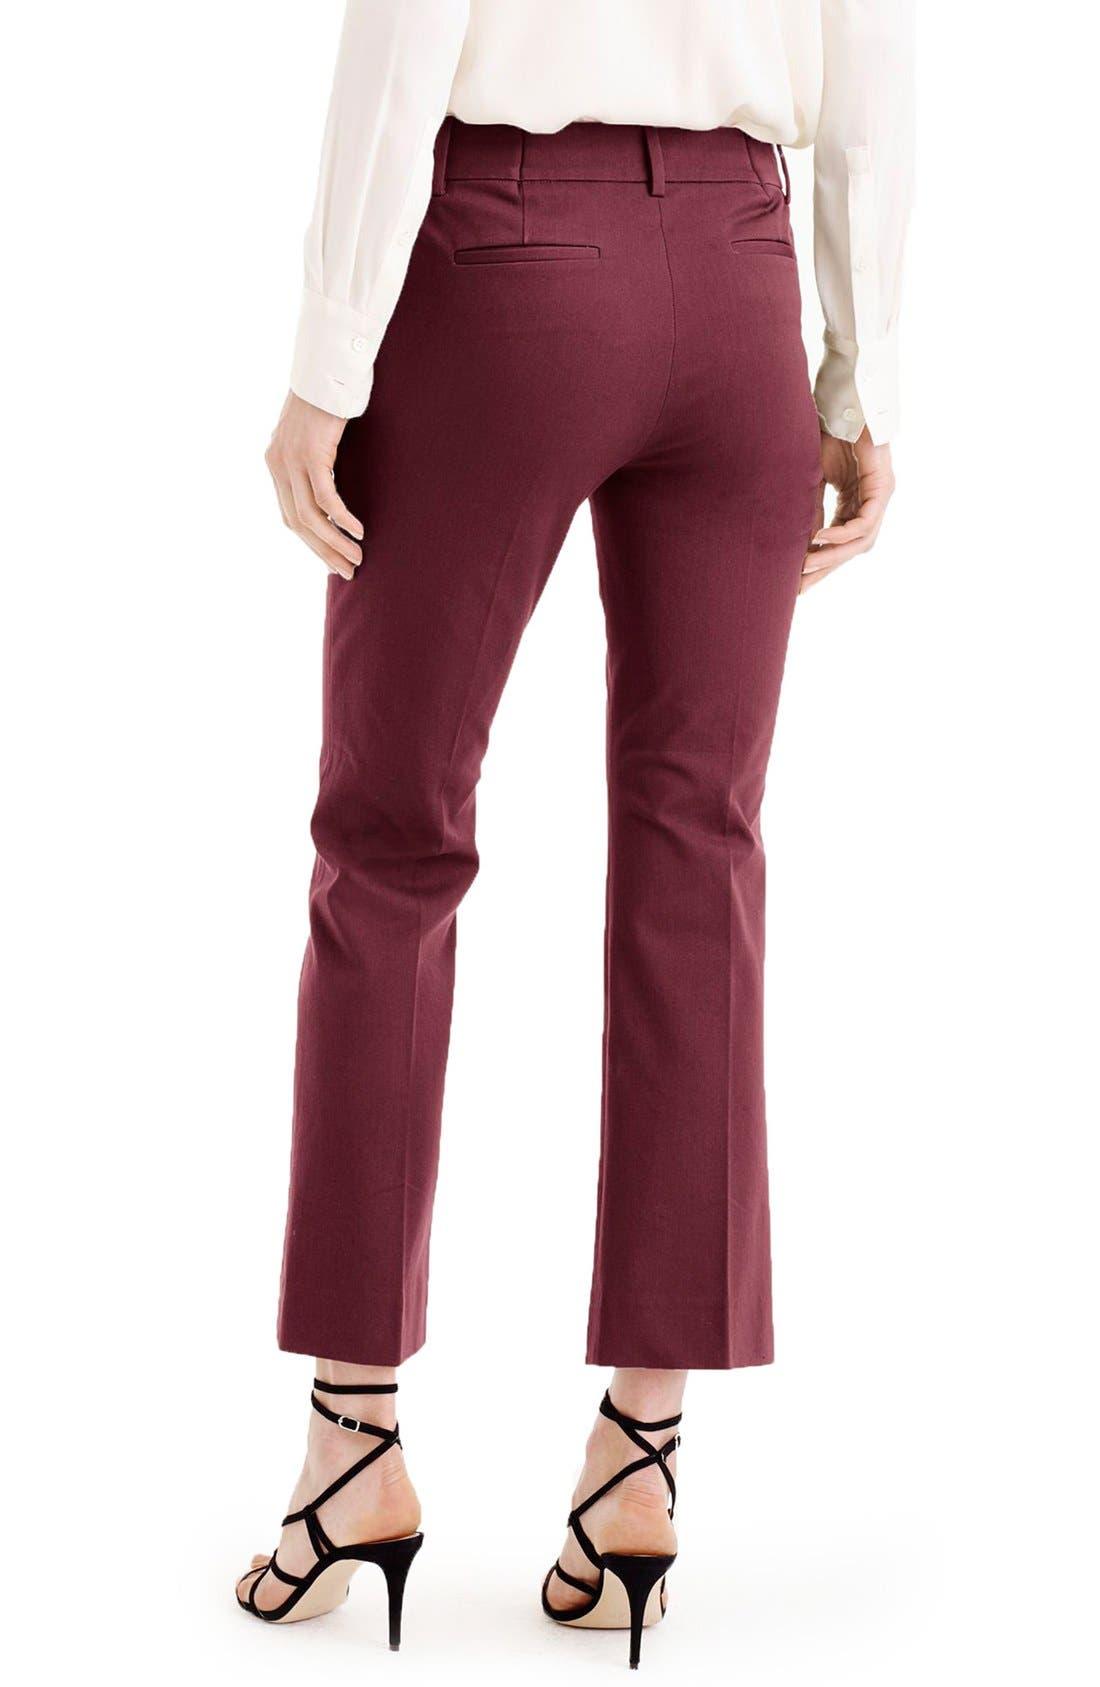 Alternate Image 2  - J.Crew 'Teddie' Bi-Stretch Cotton Blend Pants (Regular & Petite)